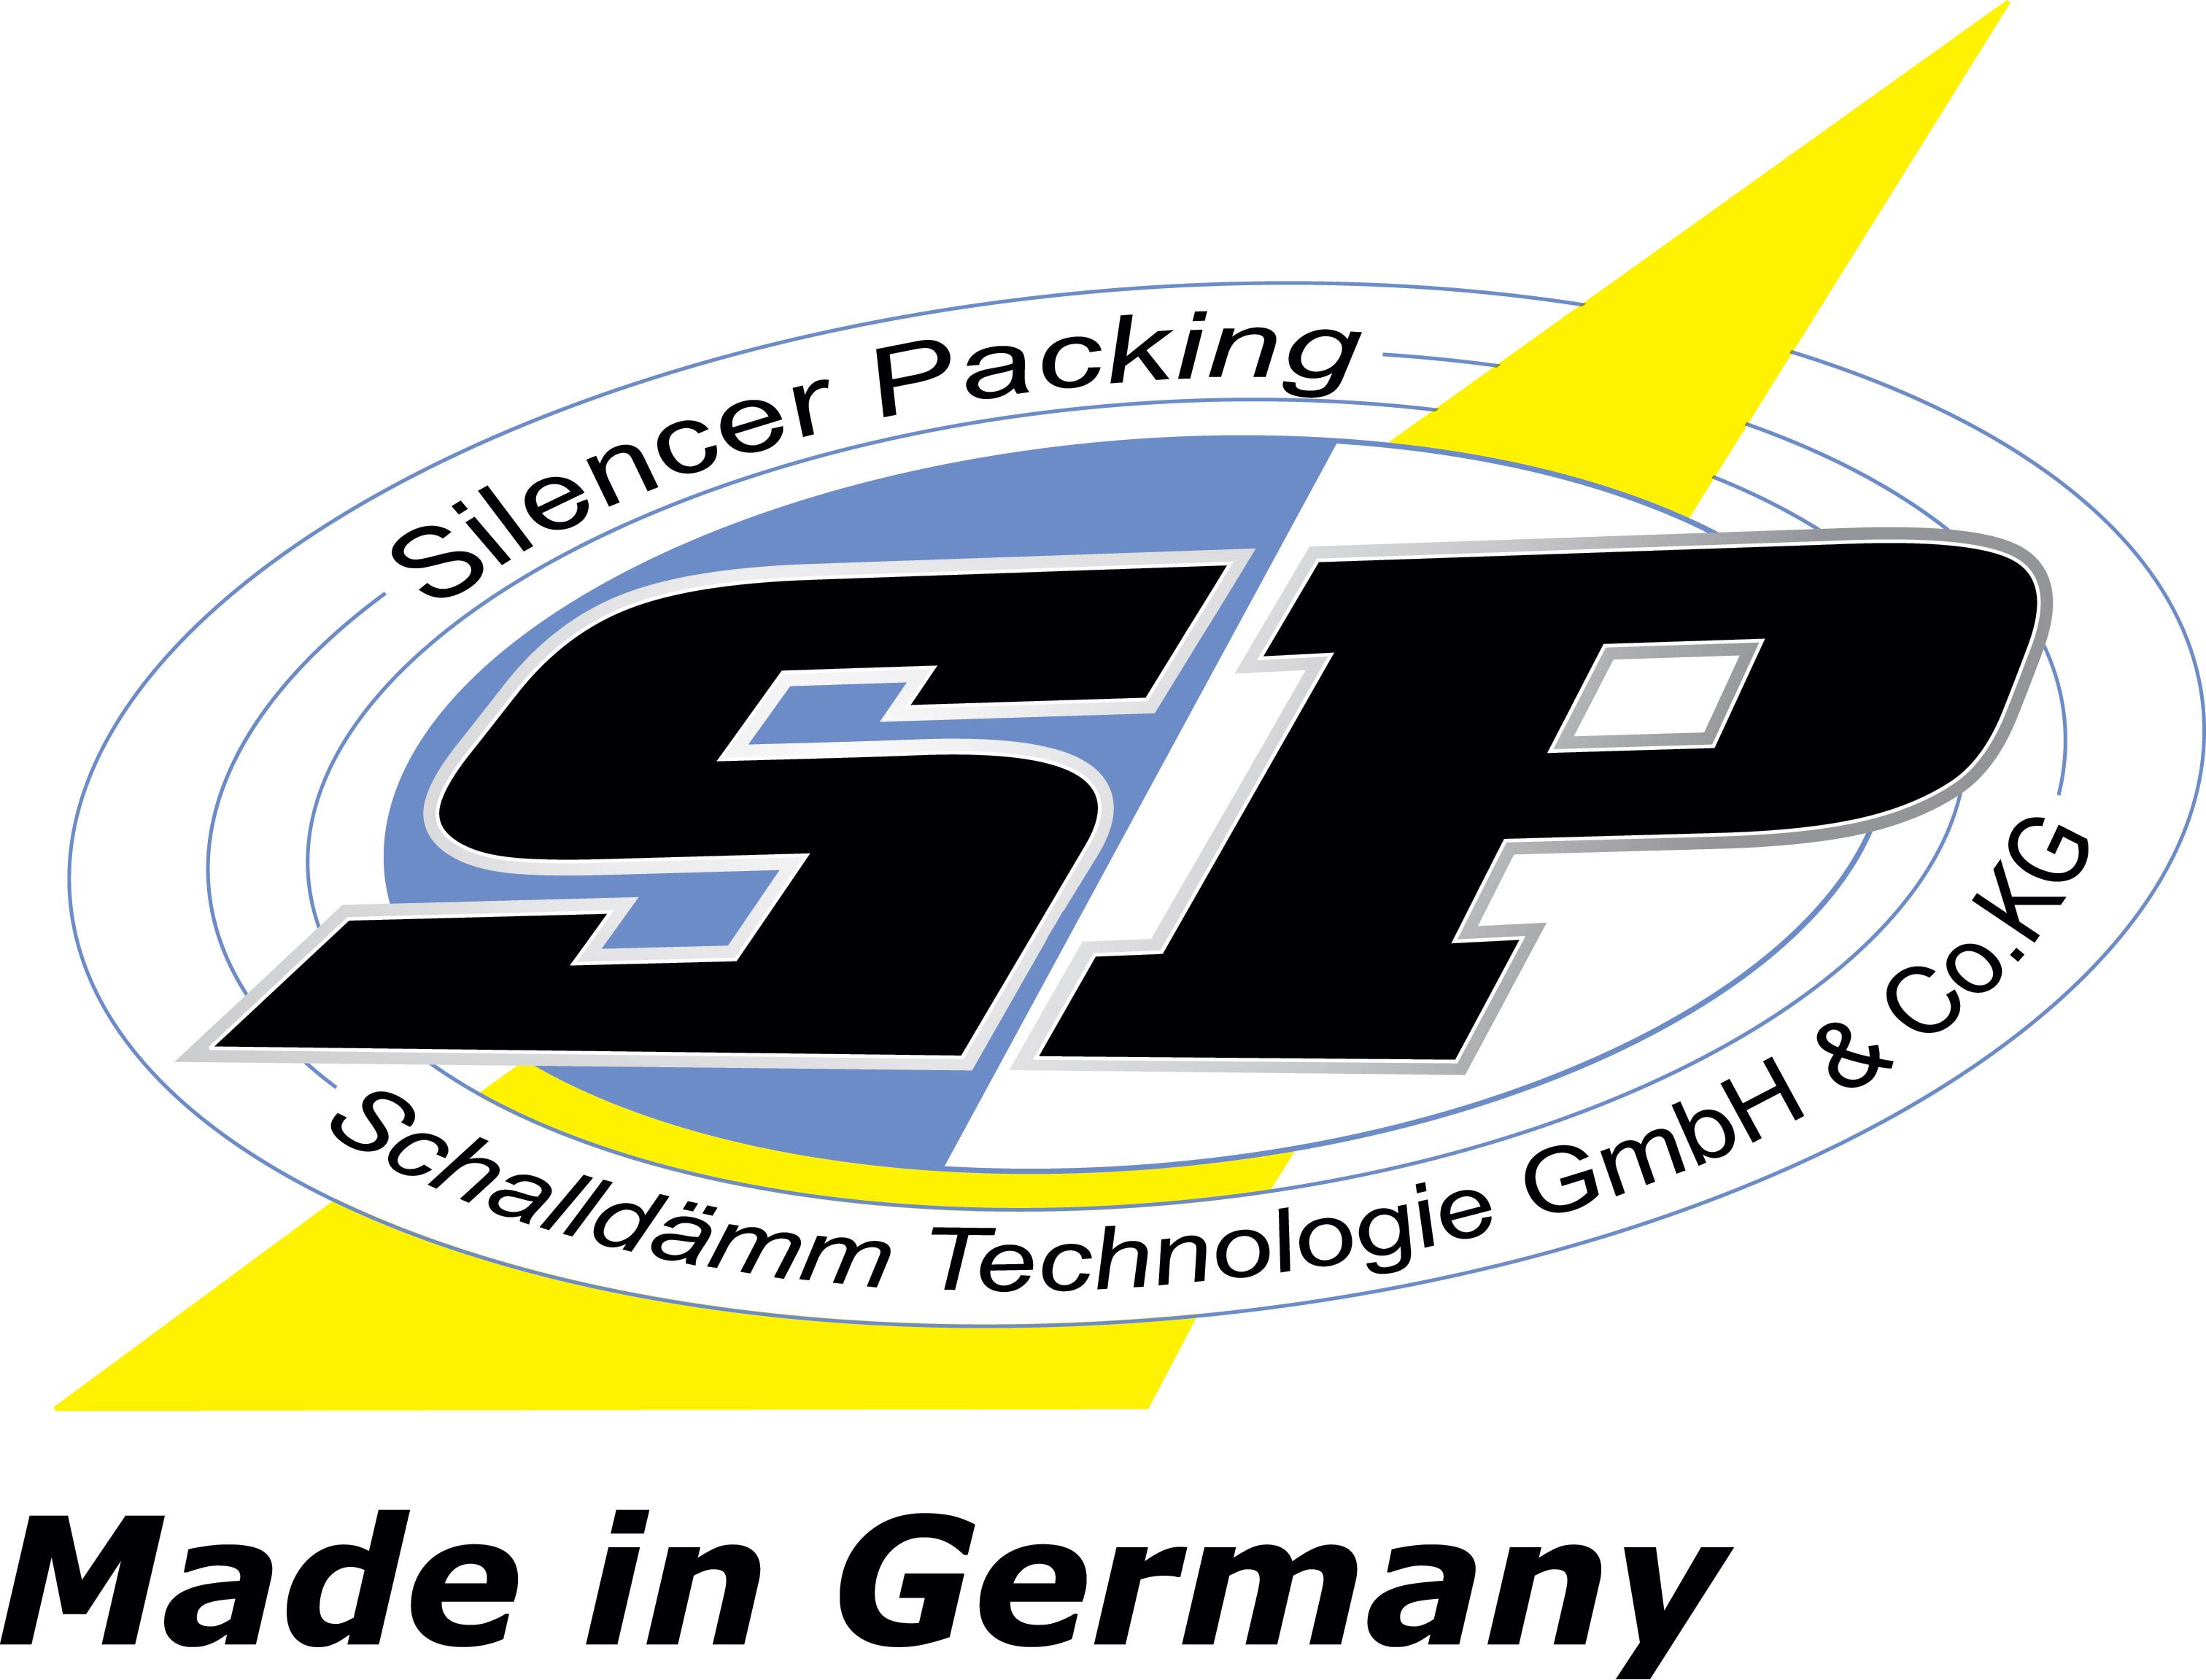 ] sp schalldmm technologie logo